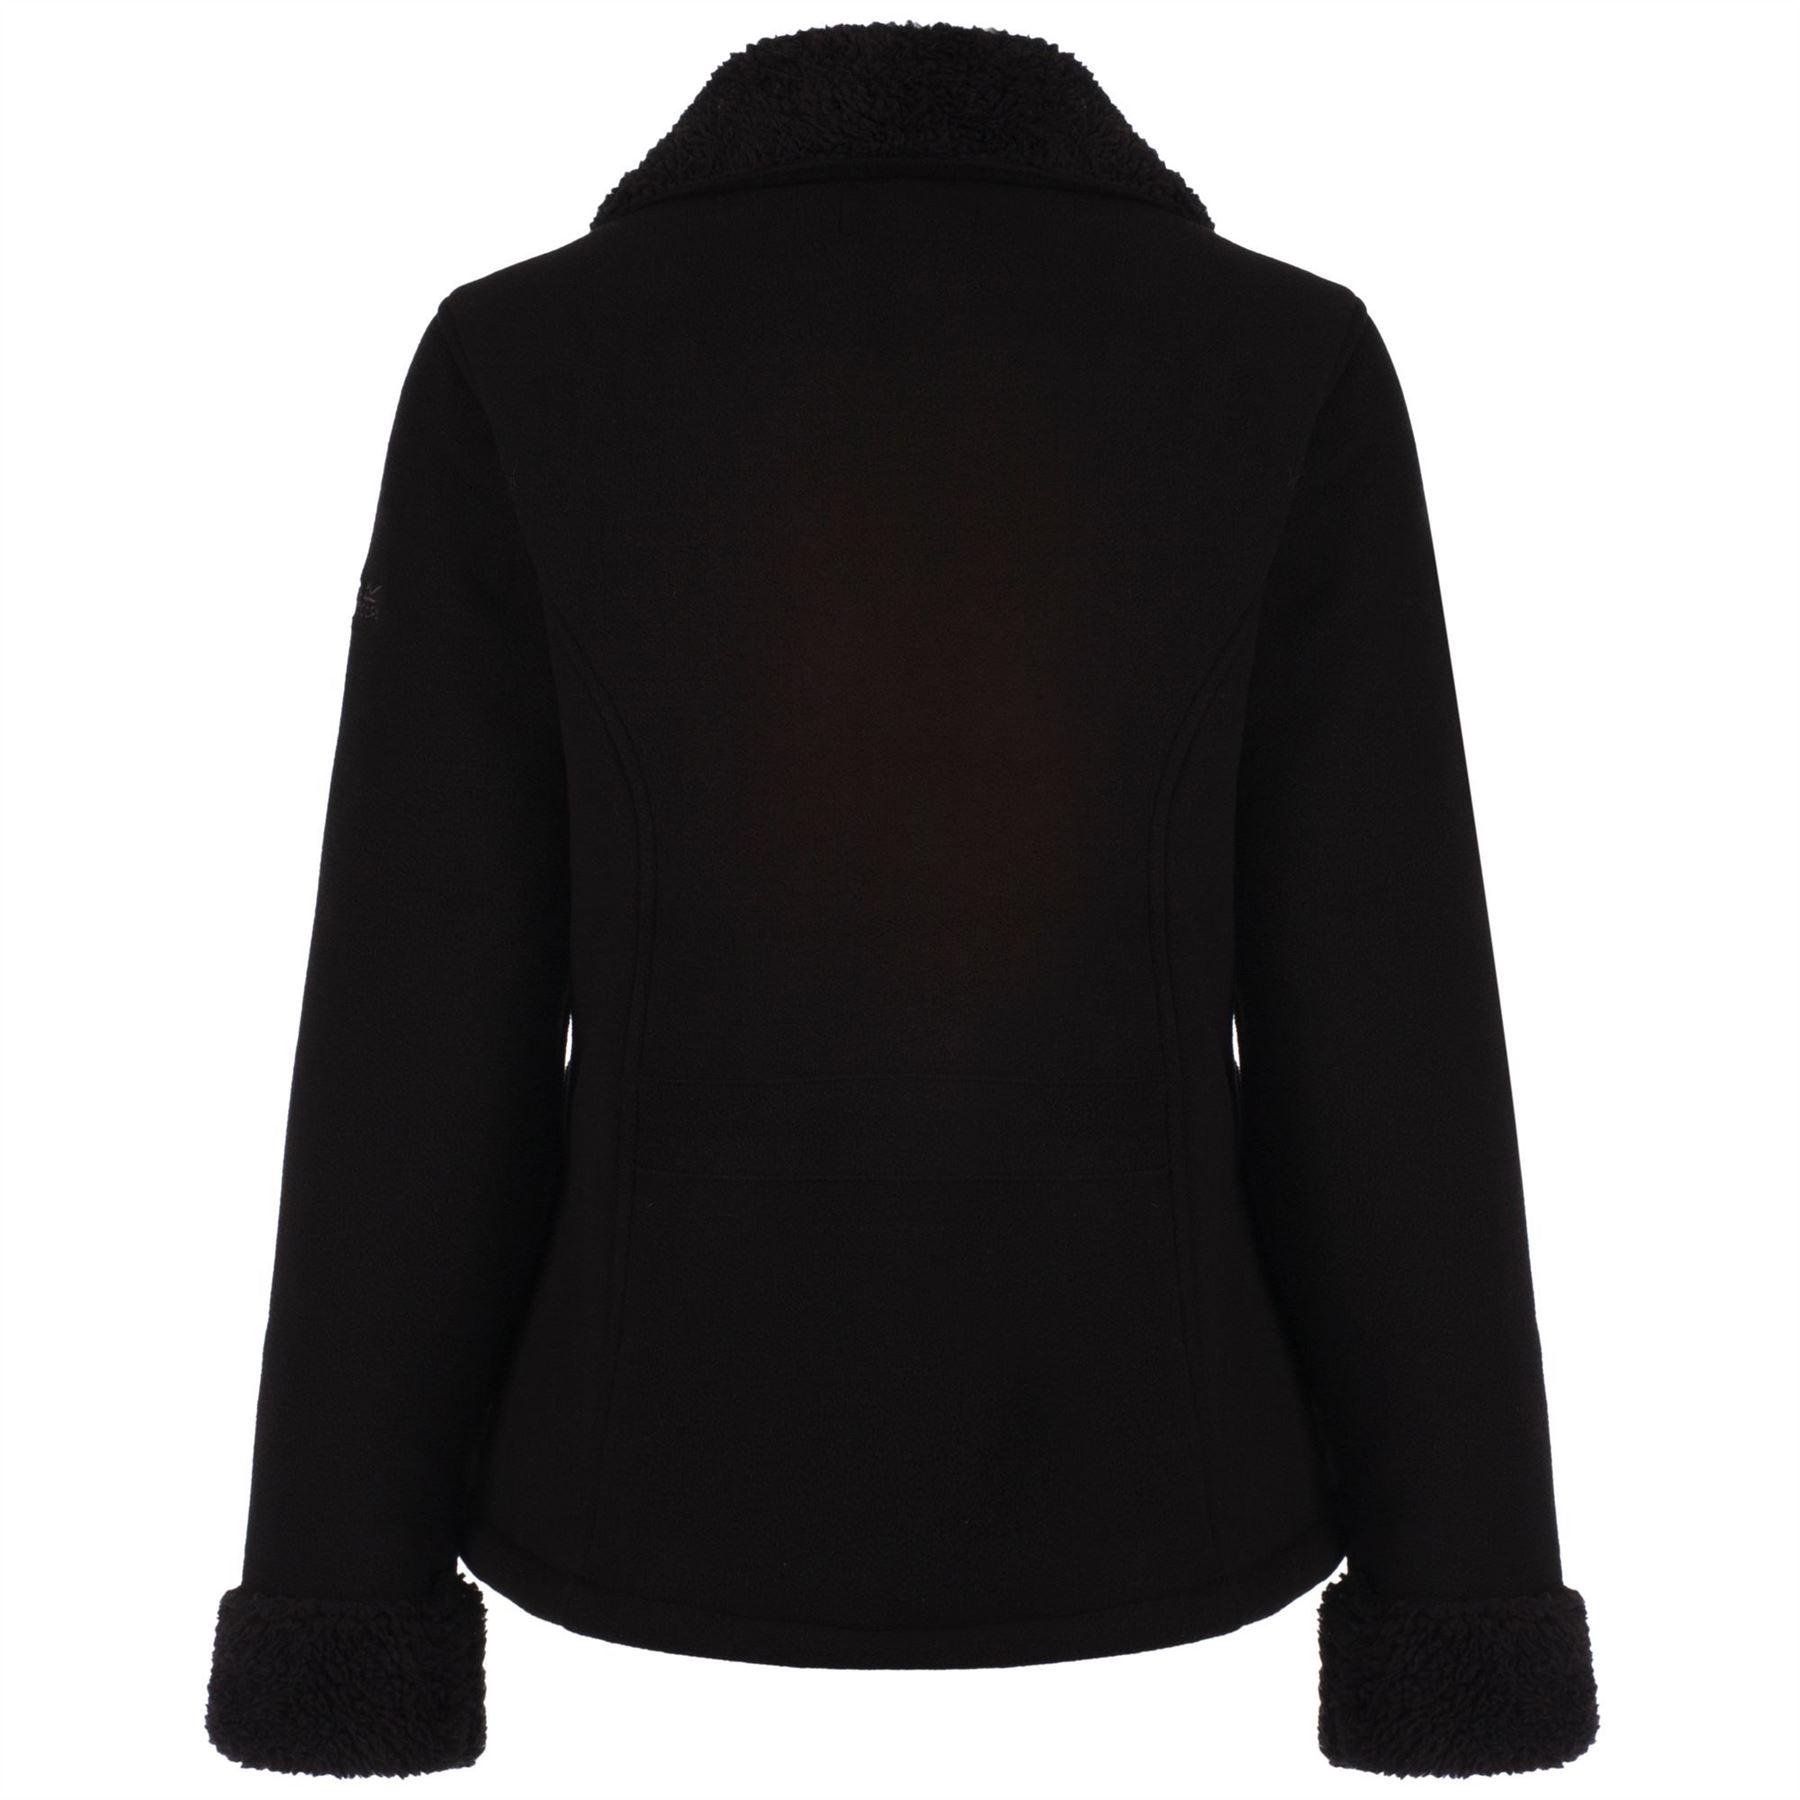 Regatta-Bernetta-Full-Zip-Womens-Micro-Fleece-RWA254 thumbnail 3